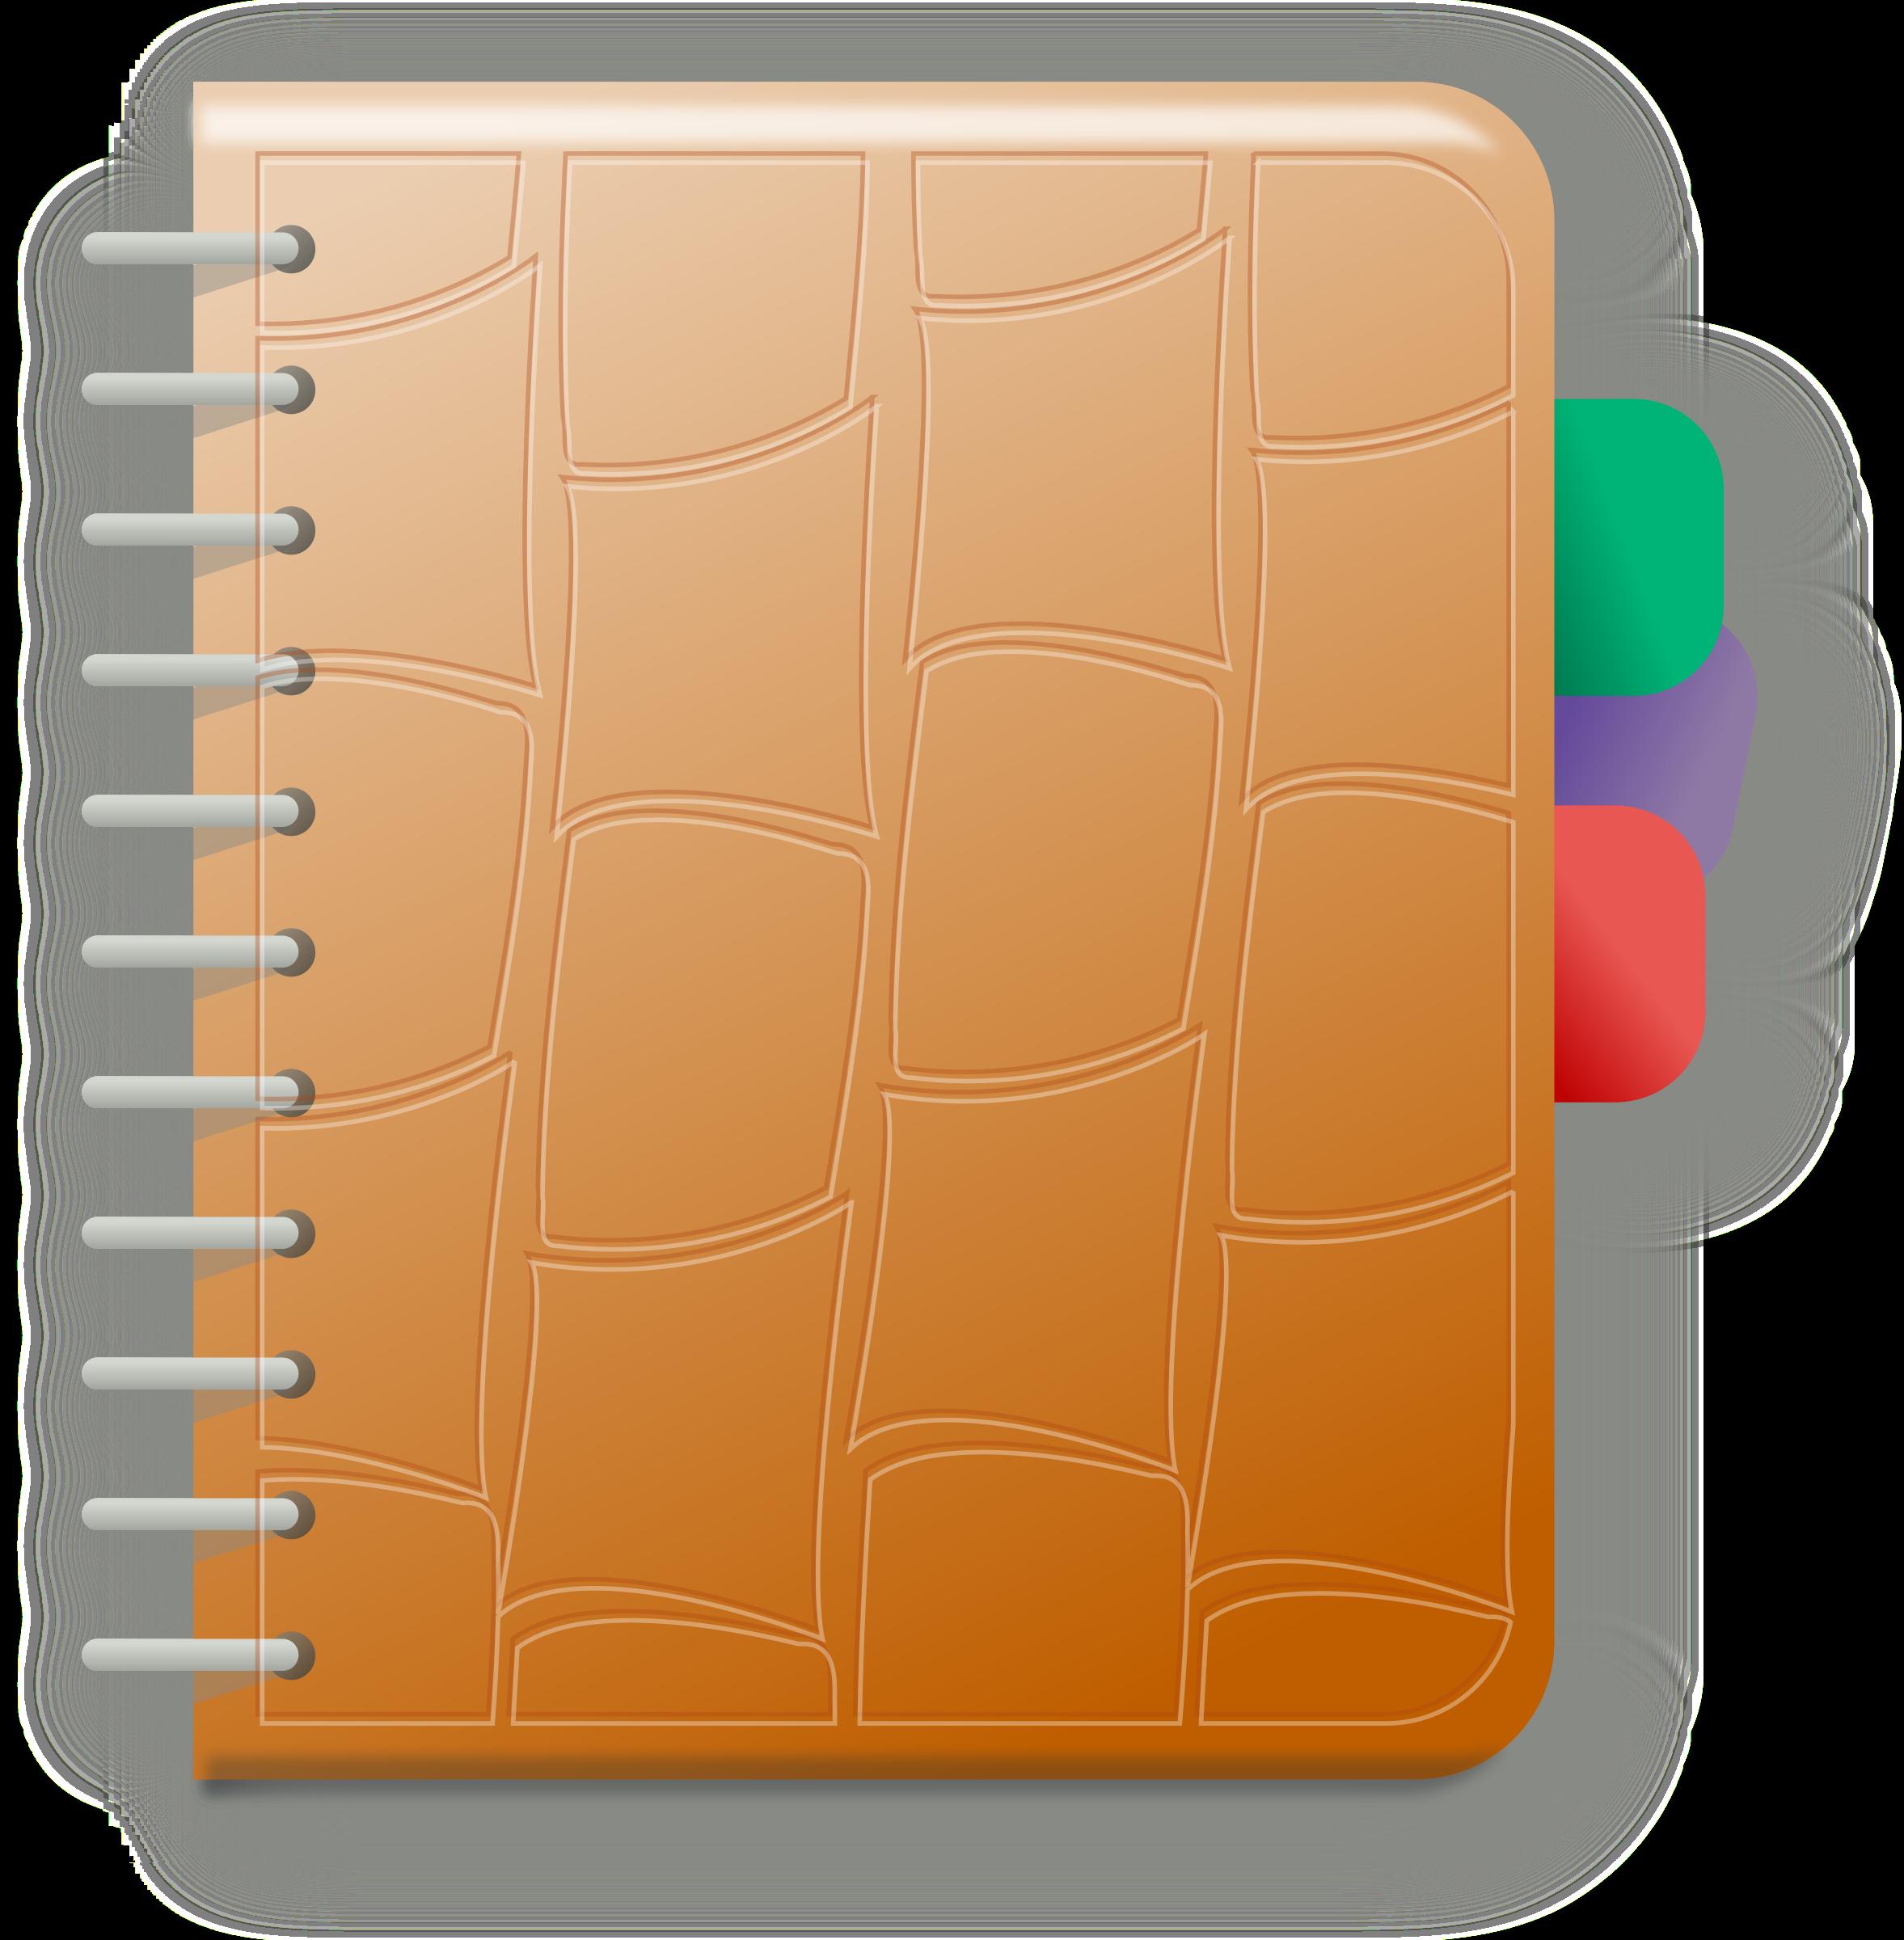 clip art stock Notebook big image png. Agenda clipart